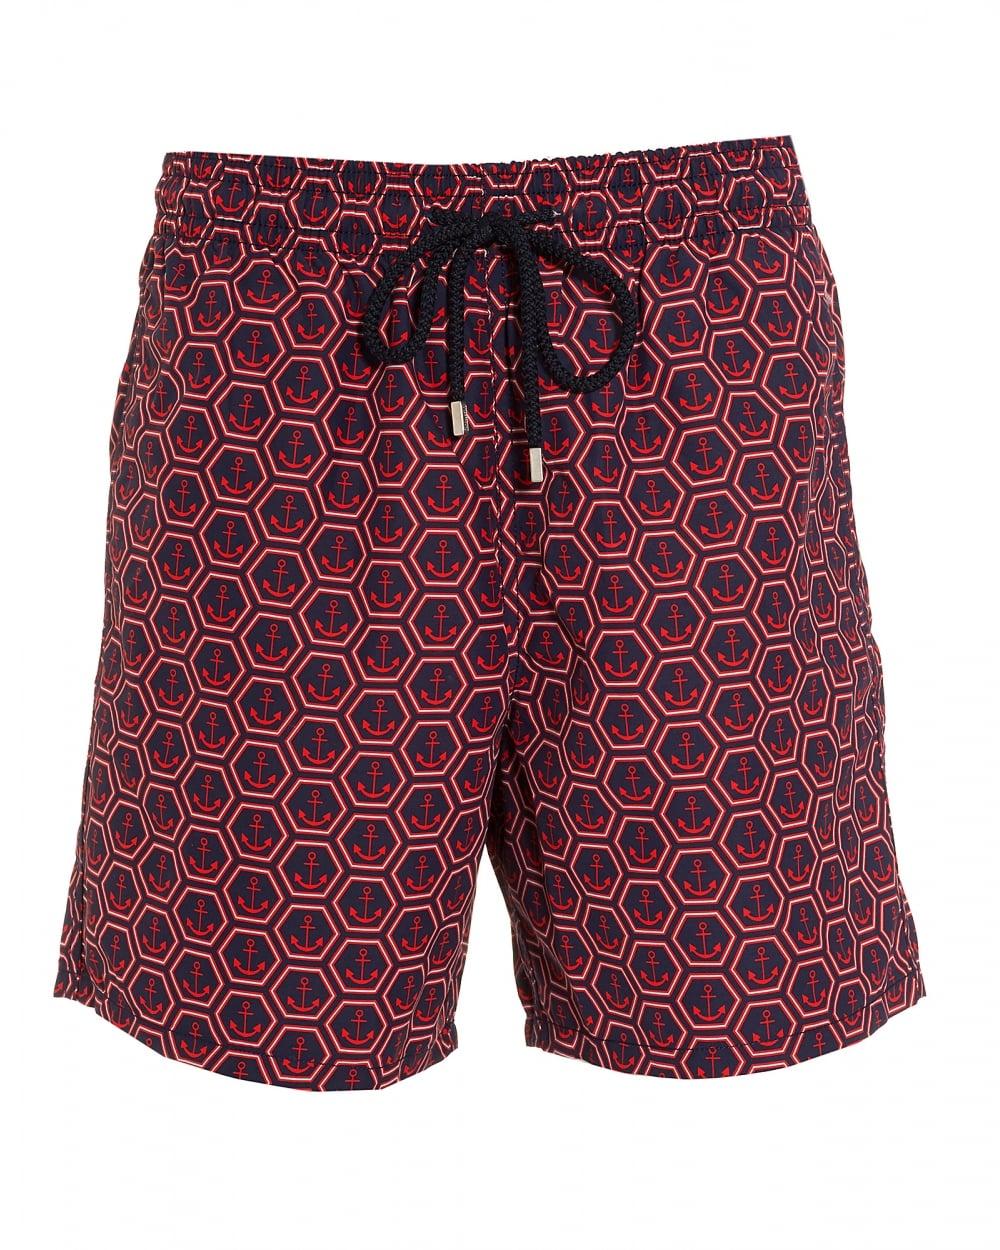 31c10399ffe8d Vilebrequin Mens Moorea Swim Shorts, Red Navy Anchors Print Swimming